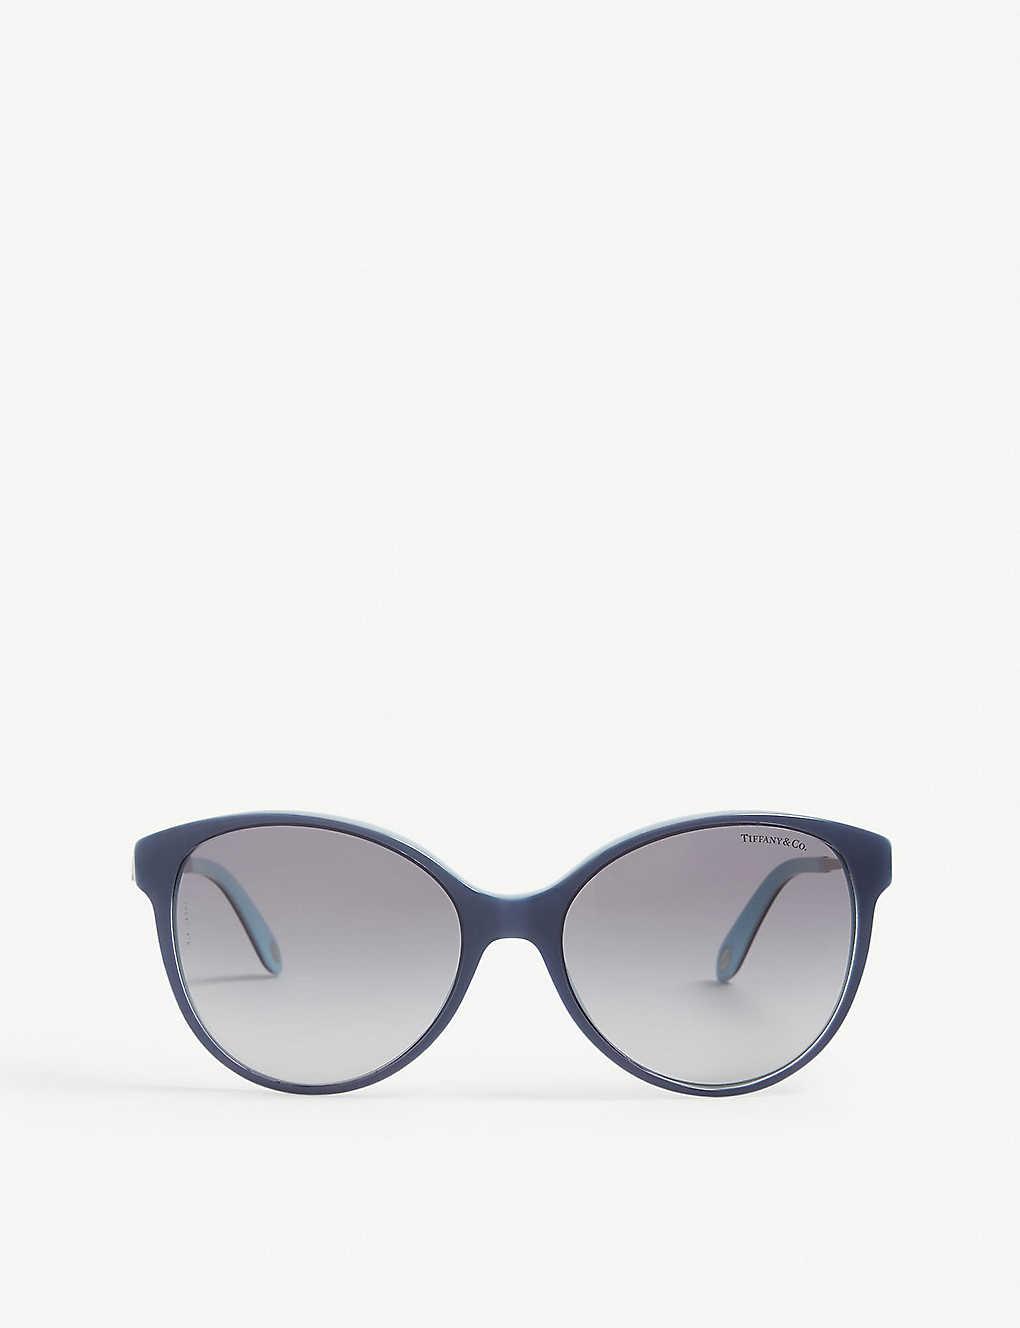 c1dbad6d365 TIFFANY   CO - Tf4127 round-frame sunglasses